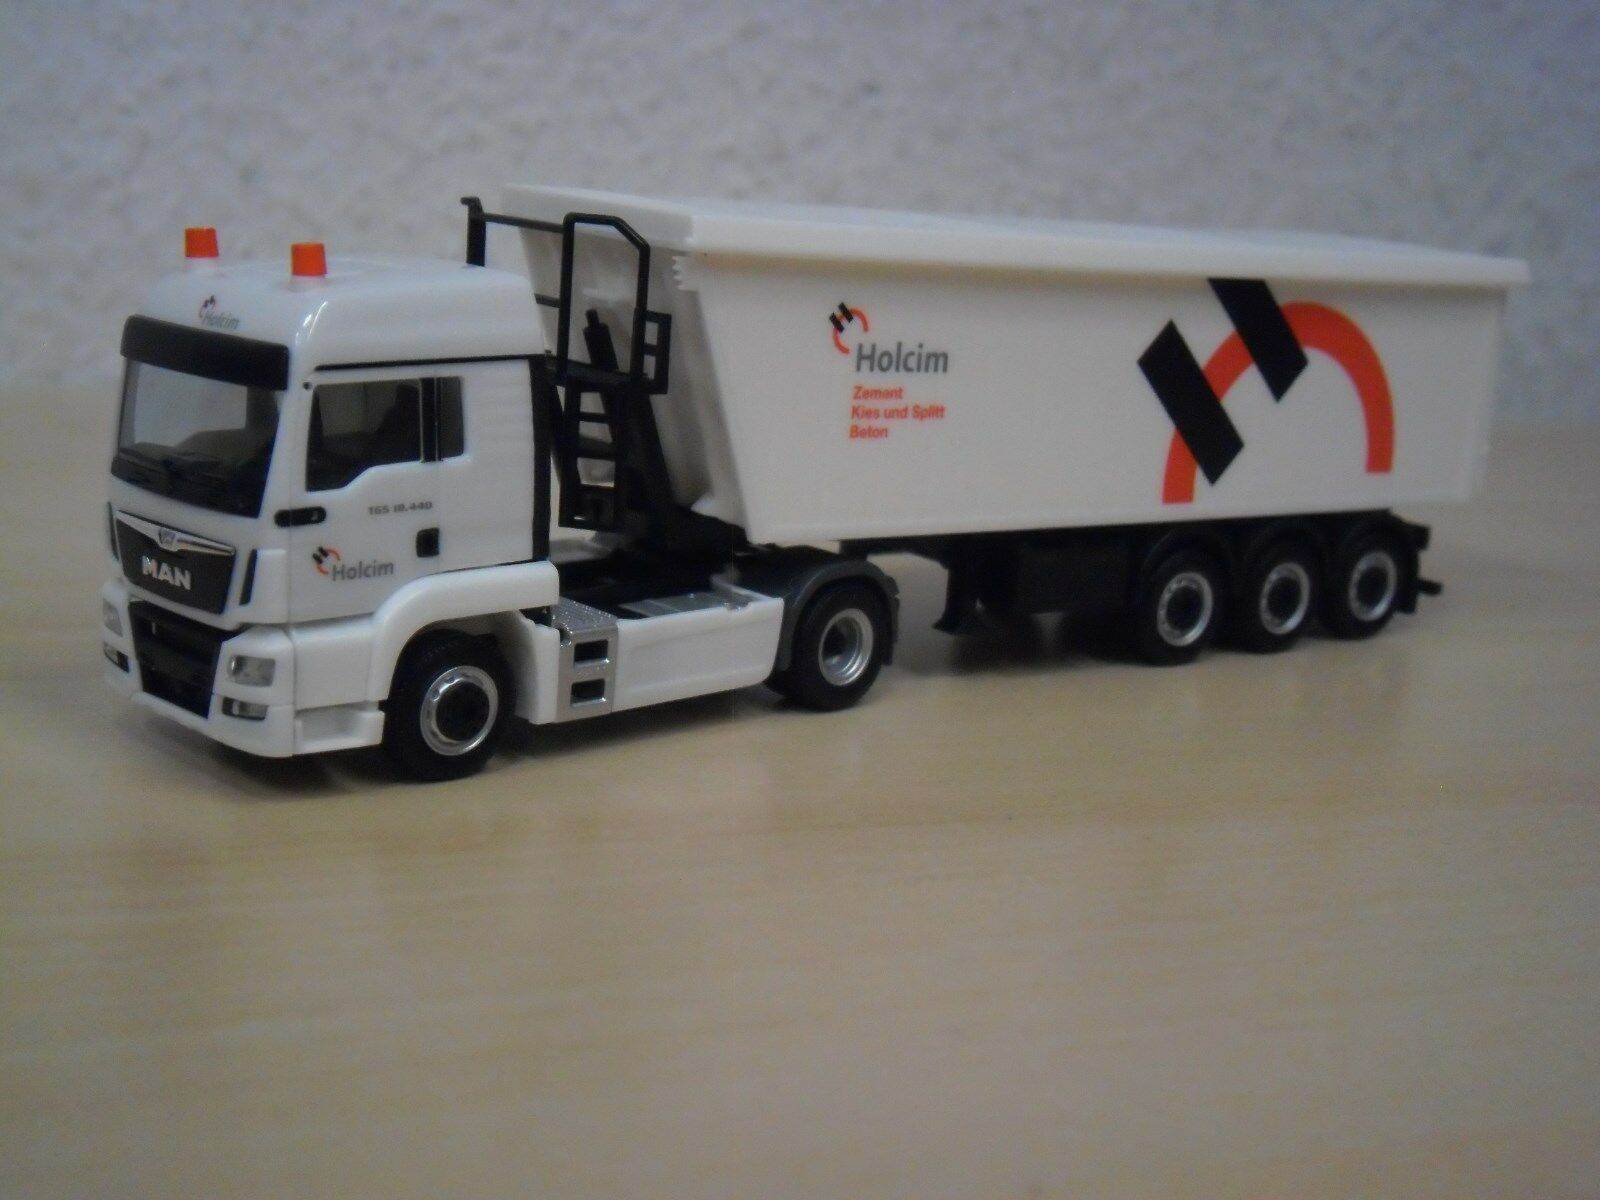 Herpa LKW MAN TG-S LX E6 Kempf-SZ Holcim 306171